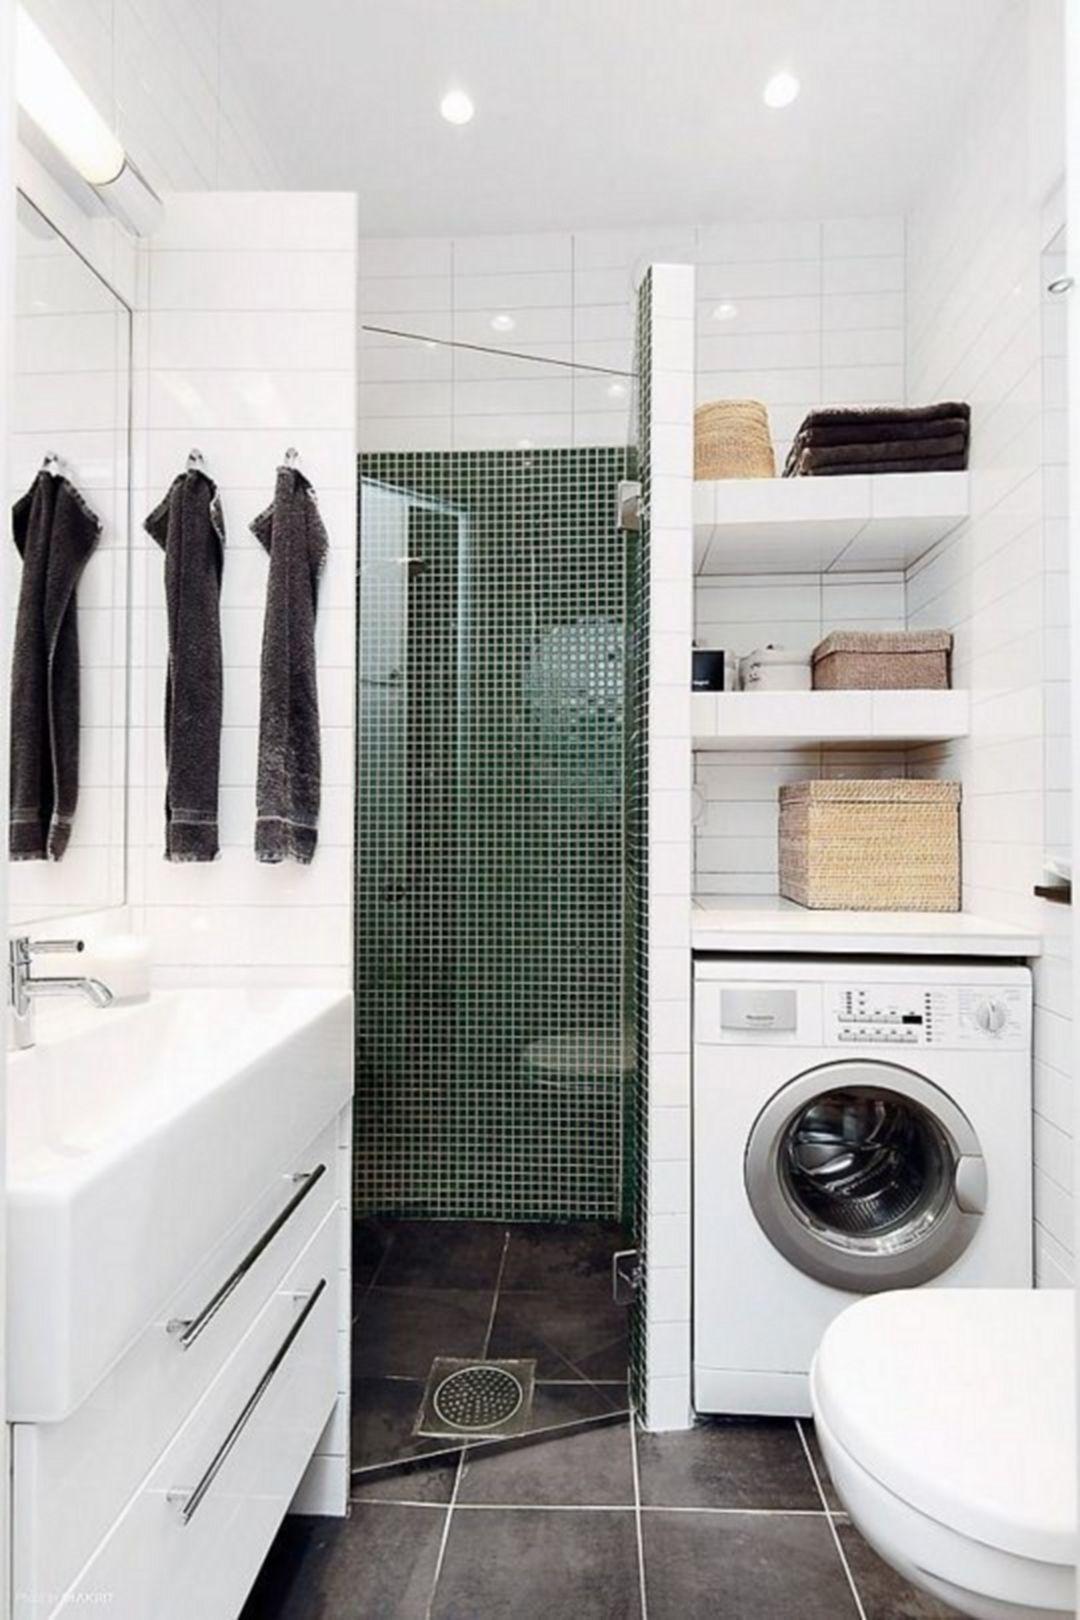 Bathroom Shower Ideas For Small Bathroom 82 Small Bathroom Remodel Laundry In Bathroom Small Remodel